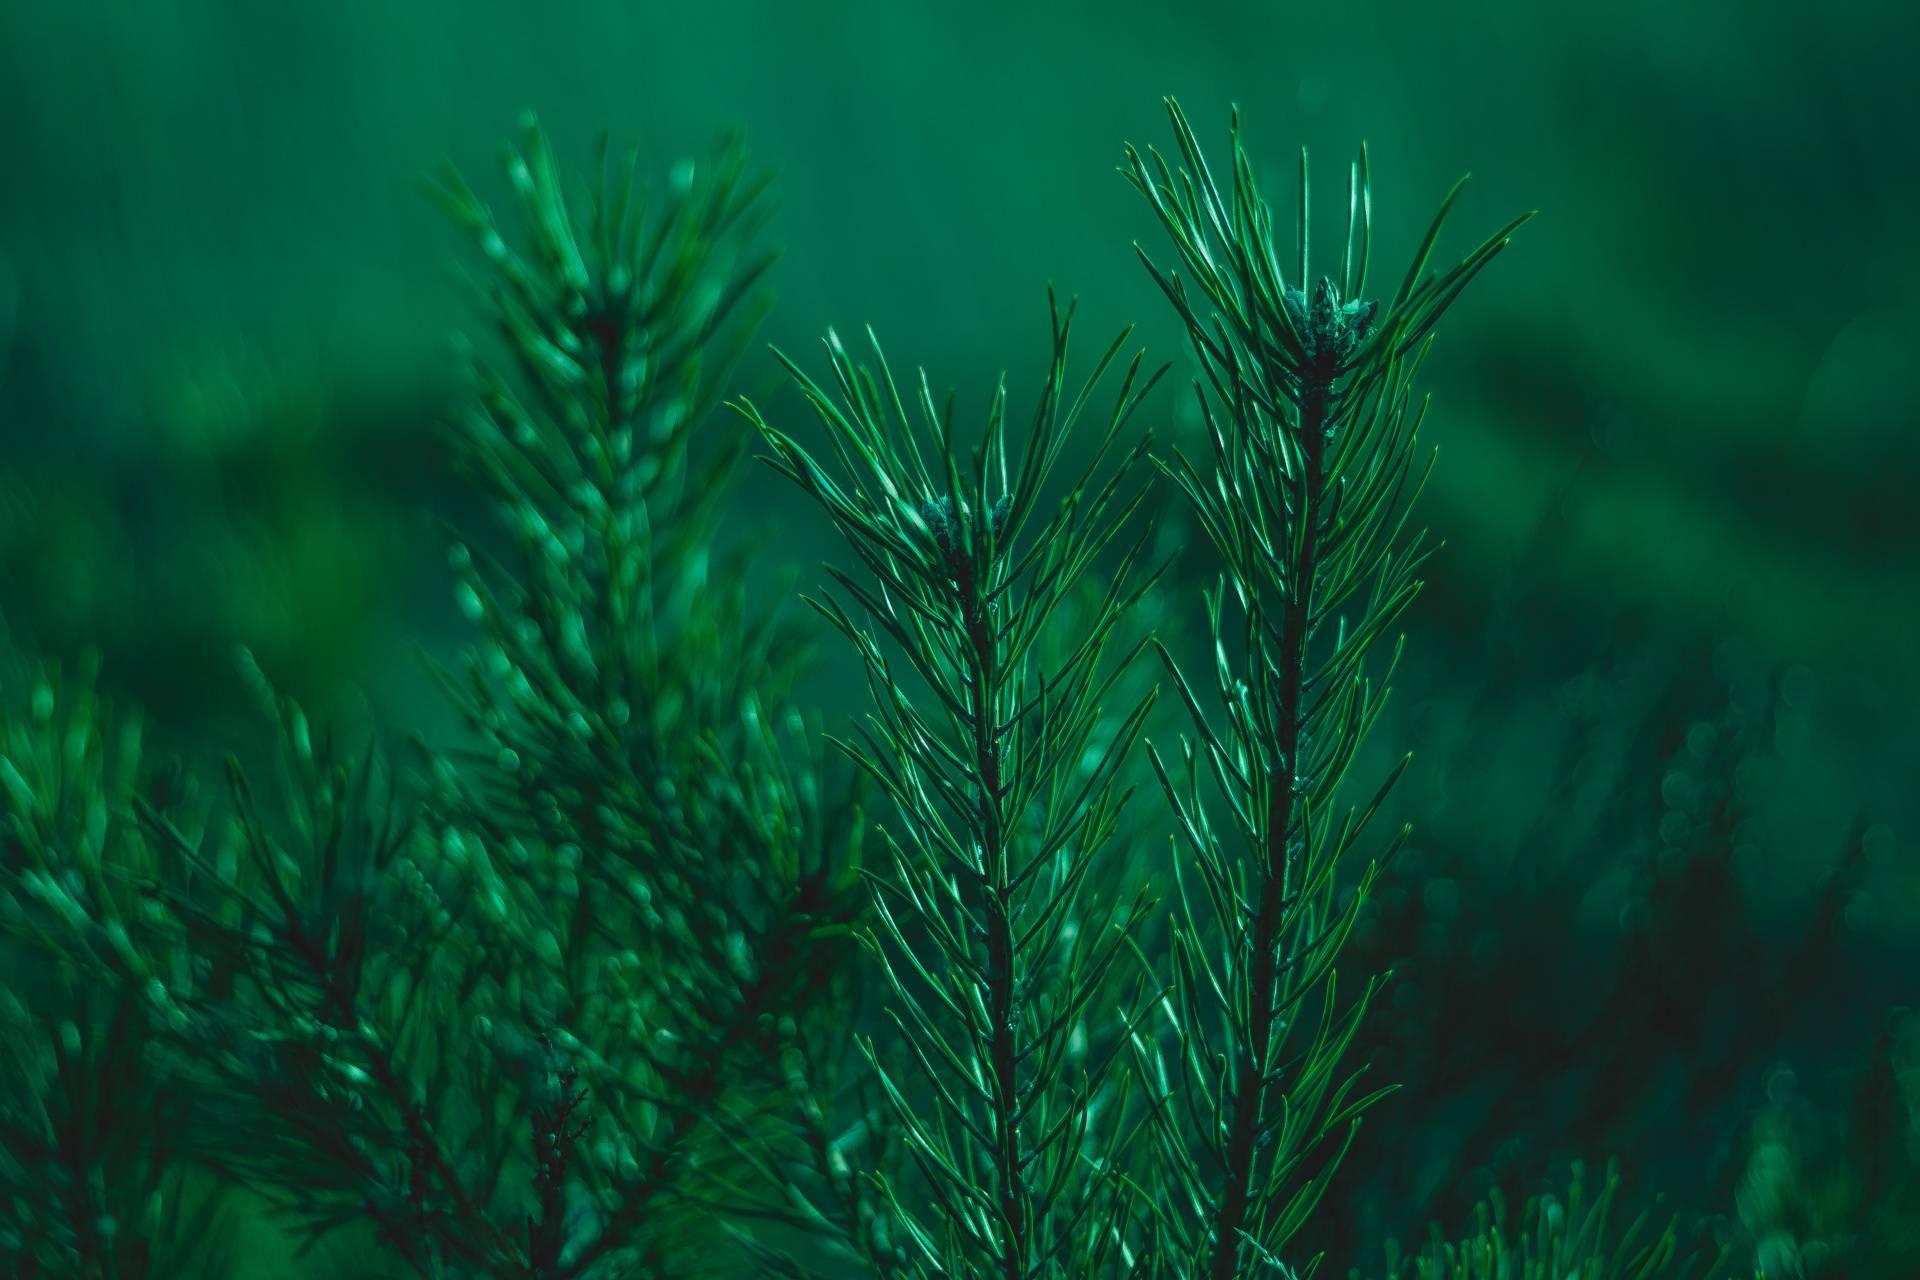 Green needles leaves